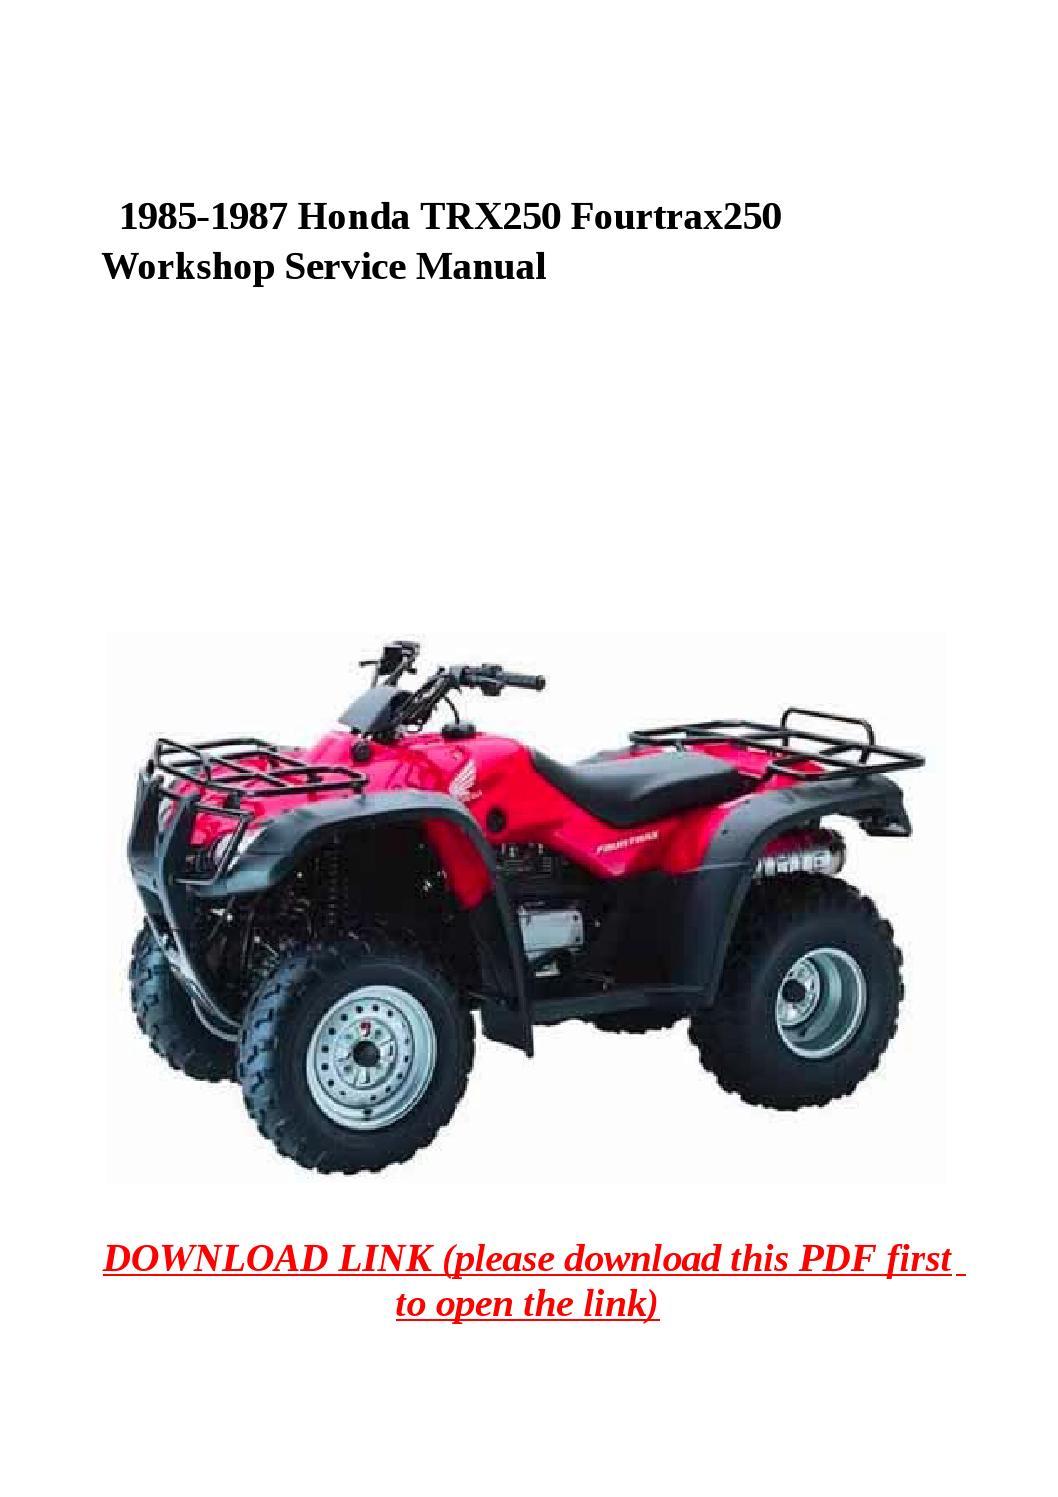 1985 1987 honda trx250 fourtrax250 workshop service manual honda trx 250 manual pdf honda trx 250 manual pdf